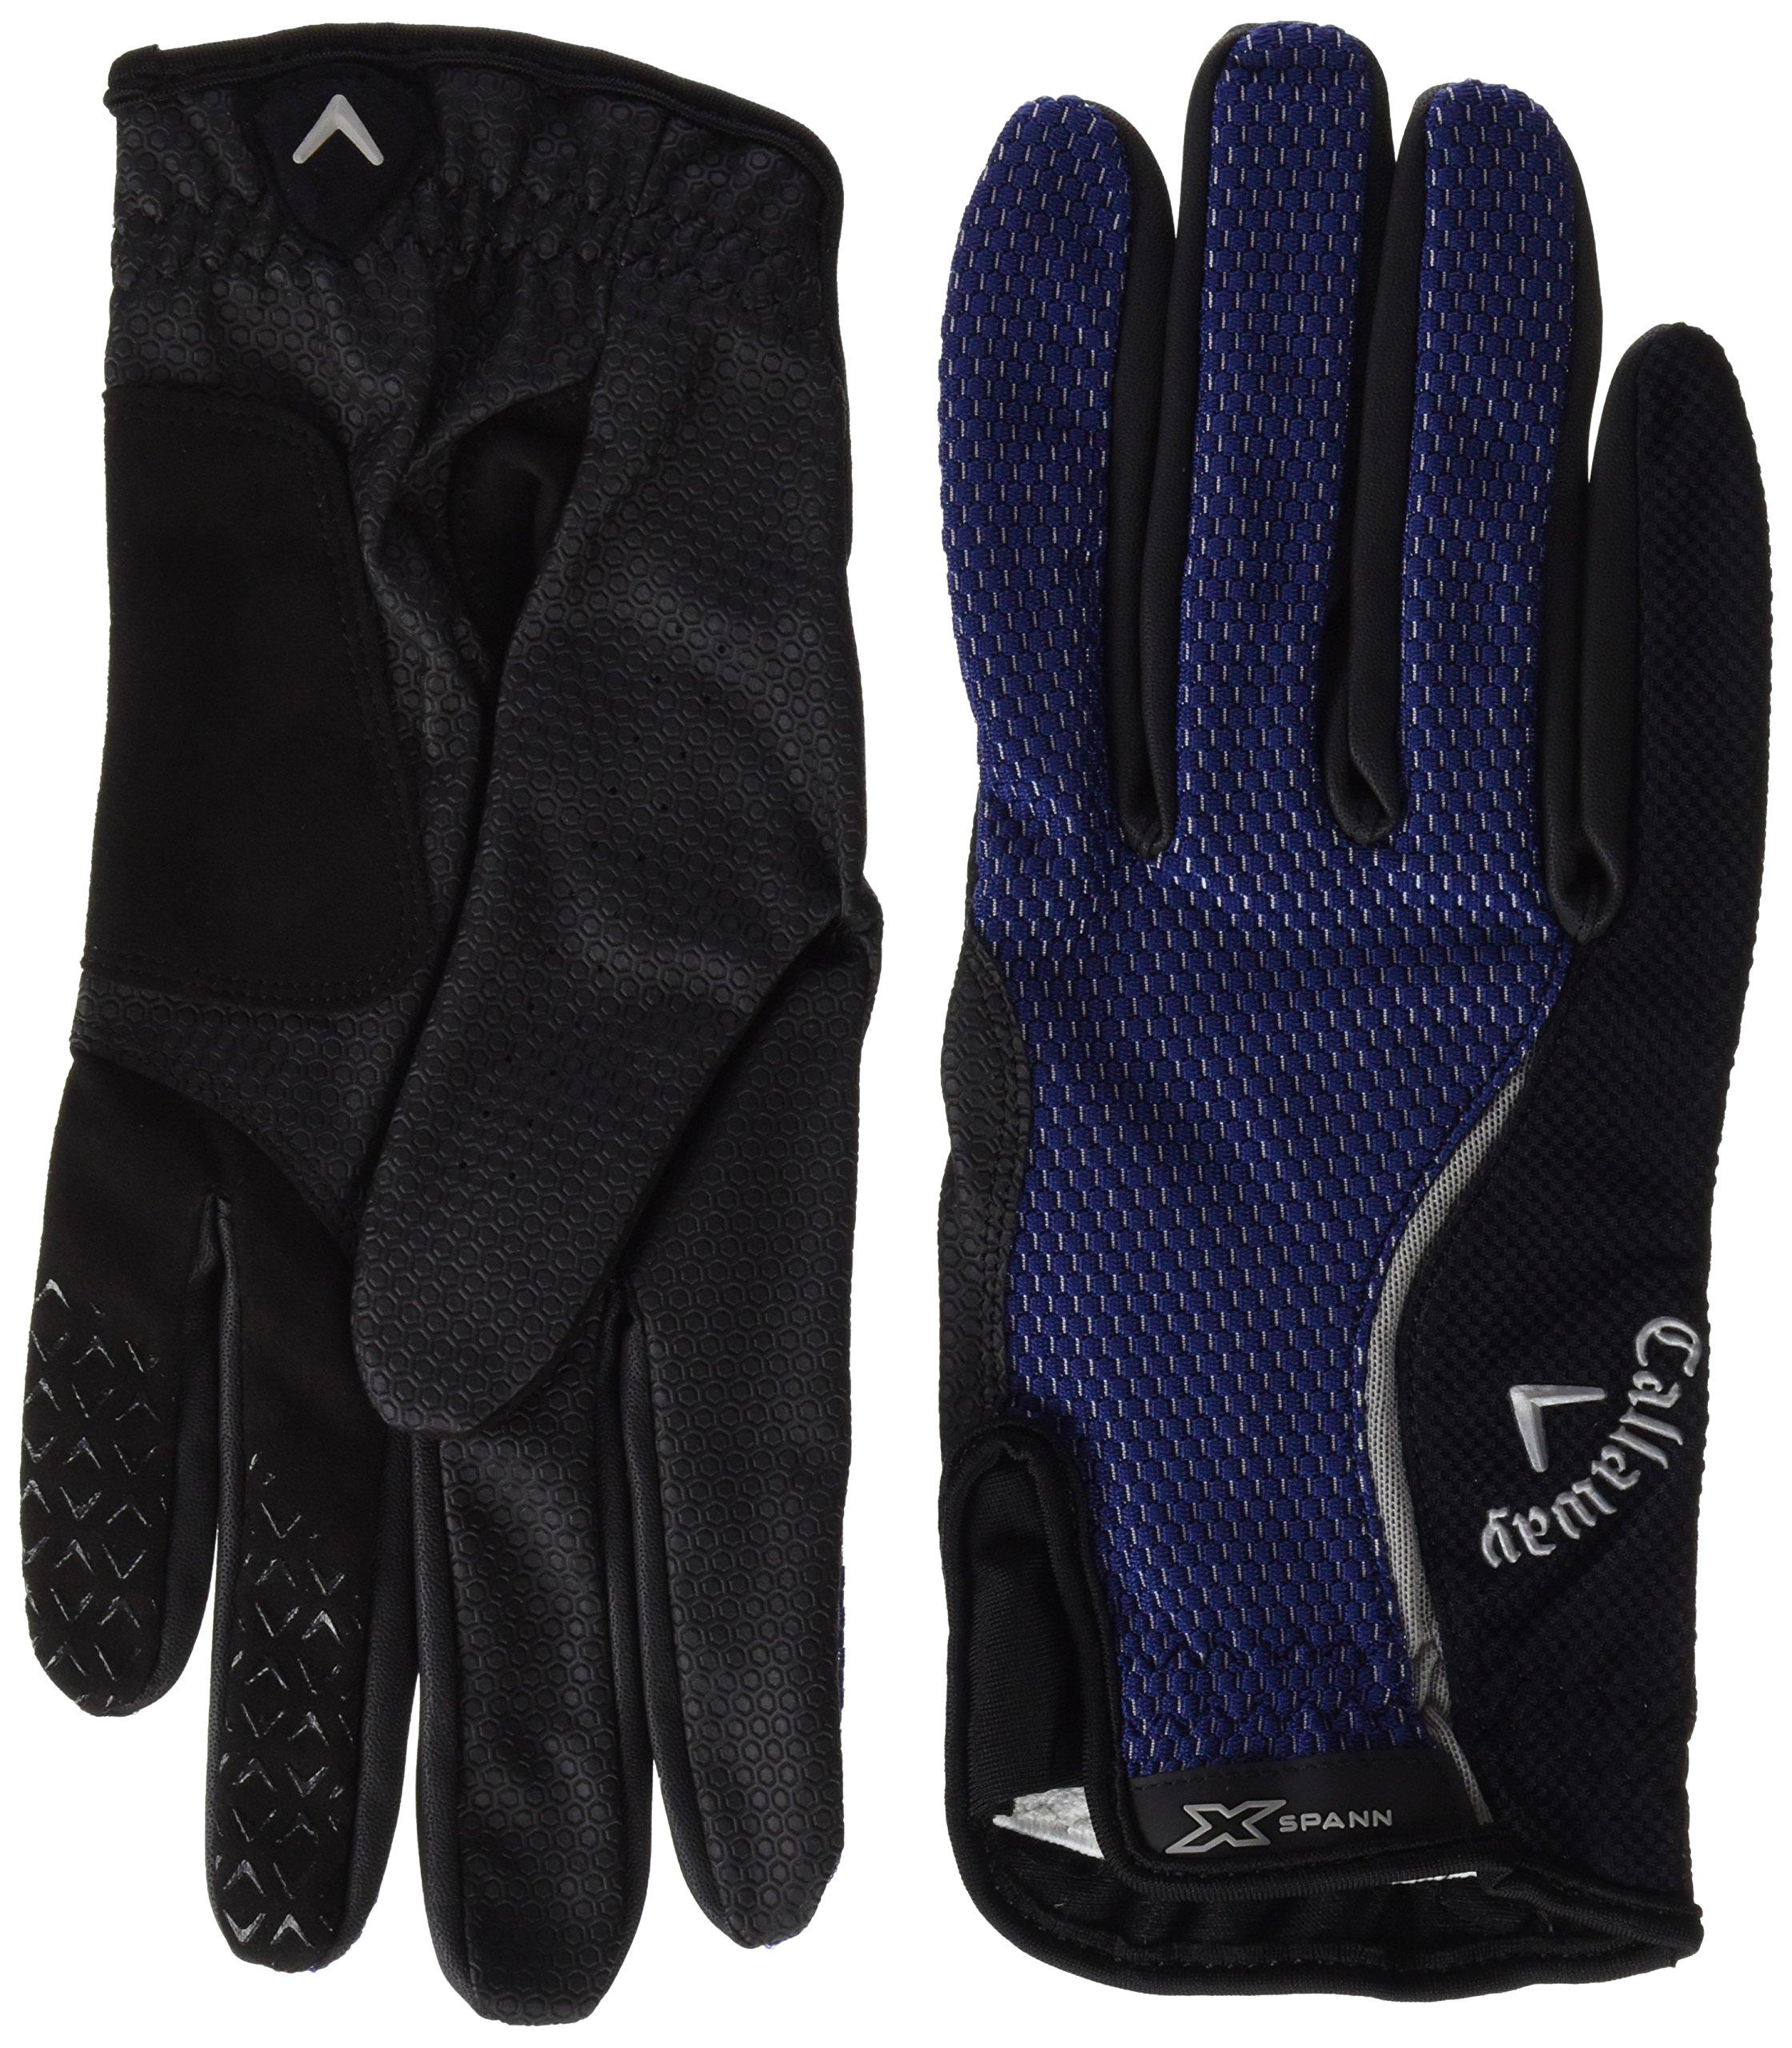 Callaway 2015 X-Spann All-Weather Performance Mens Compression Fit Golf Gloves-Pair Black XL